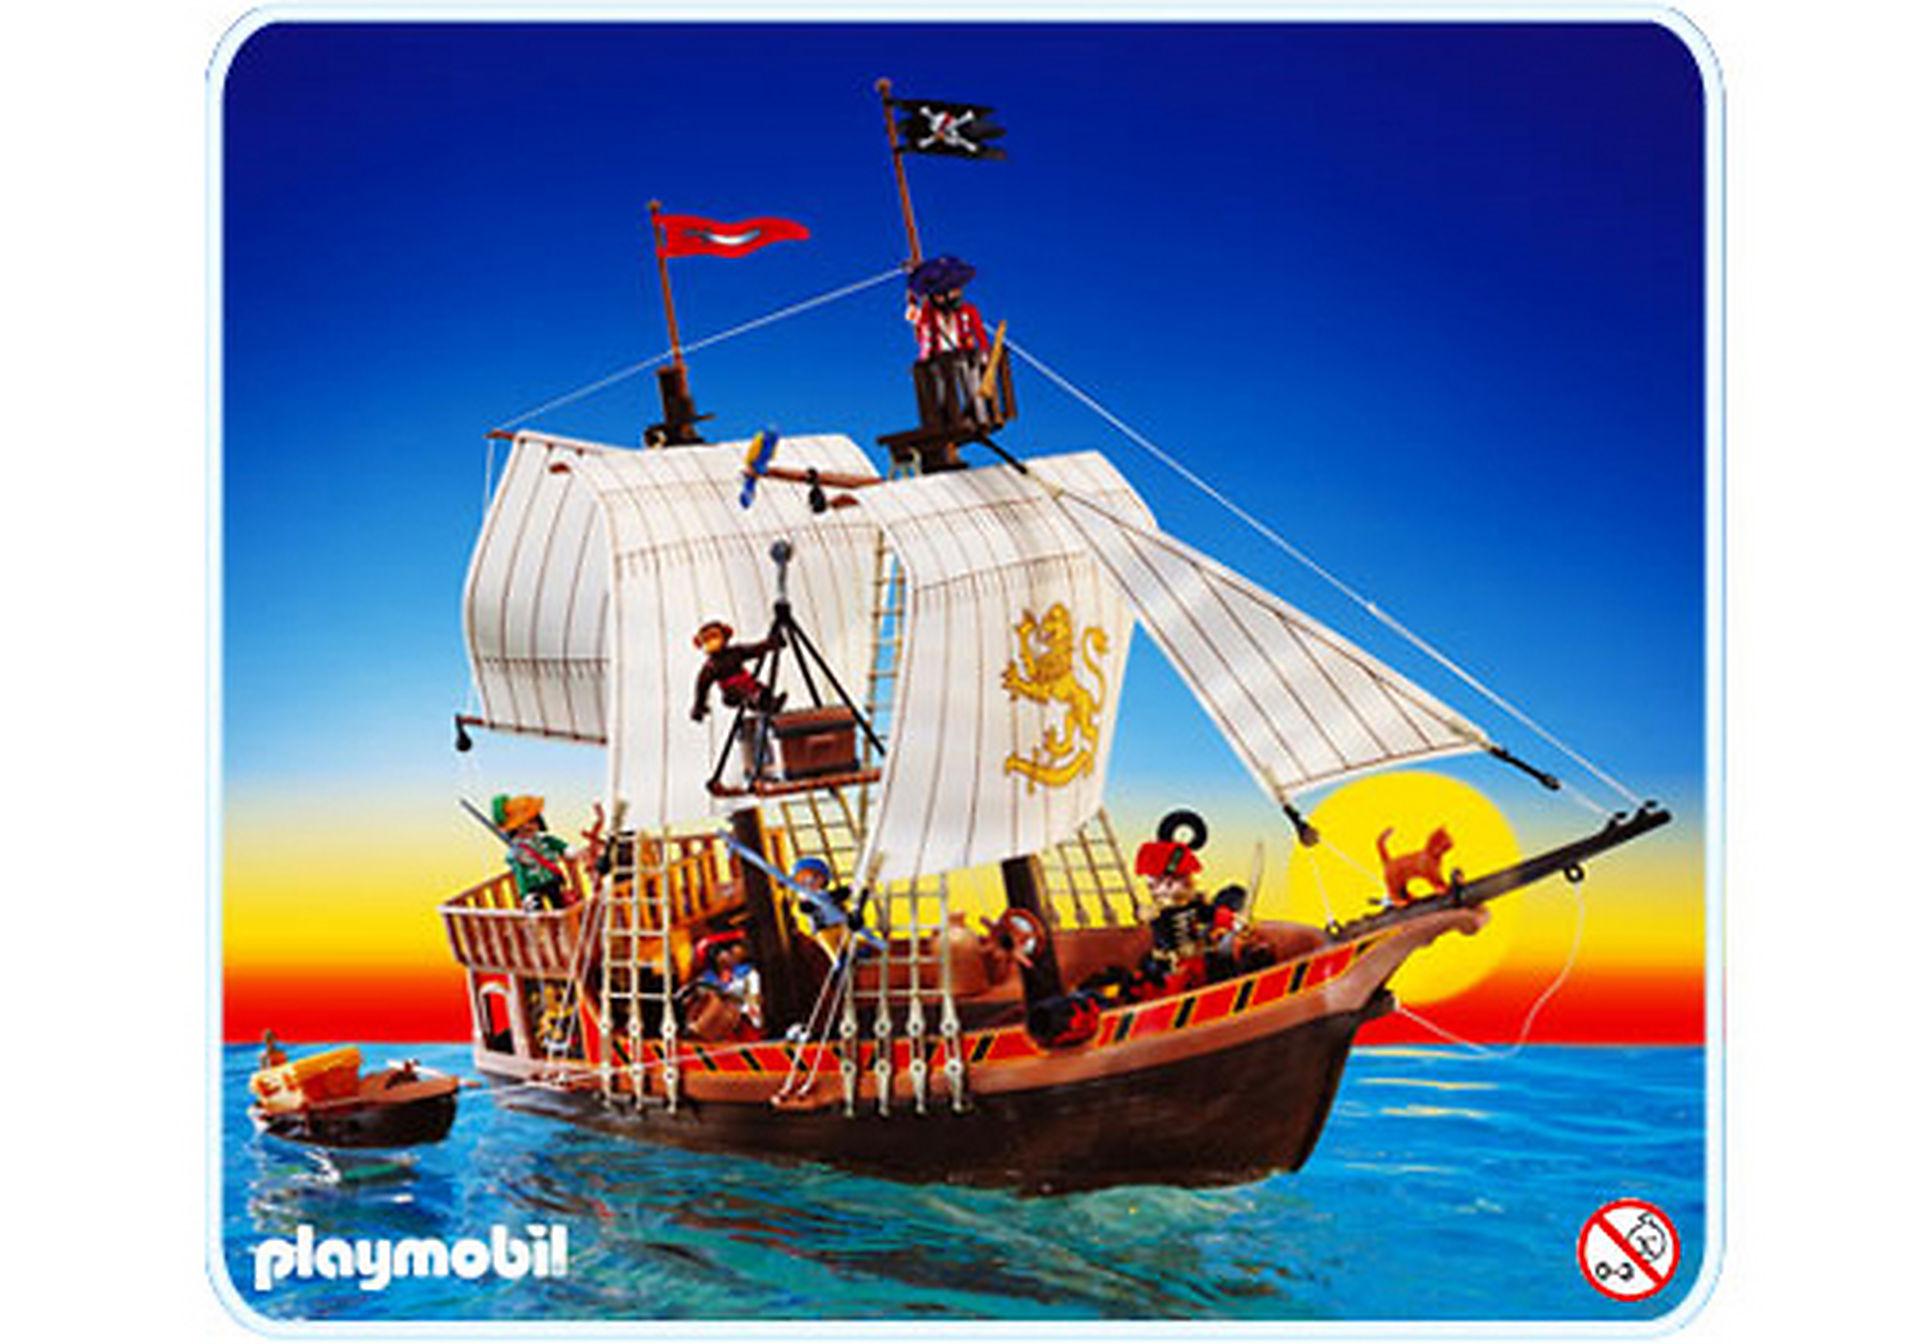 3750-A Bateau pirate zoom image1